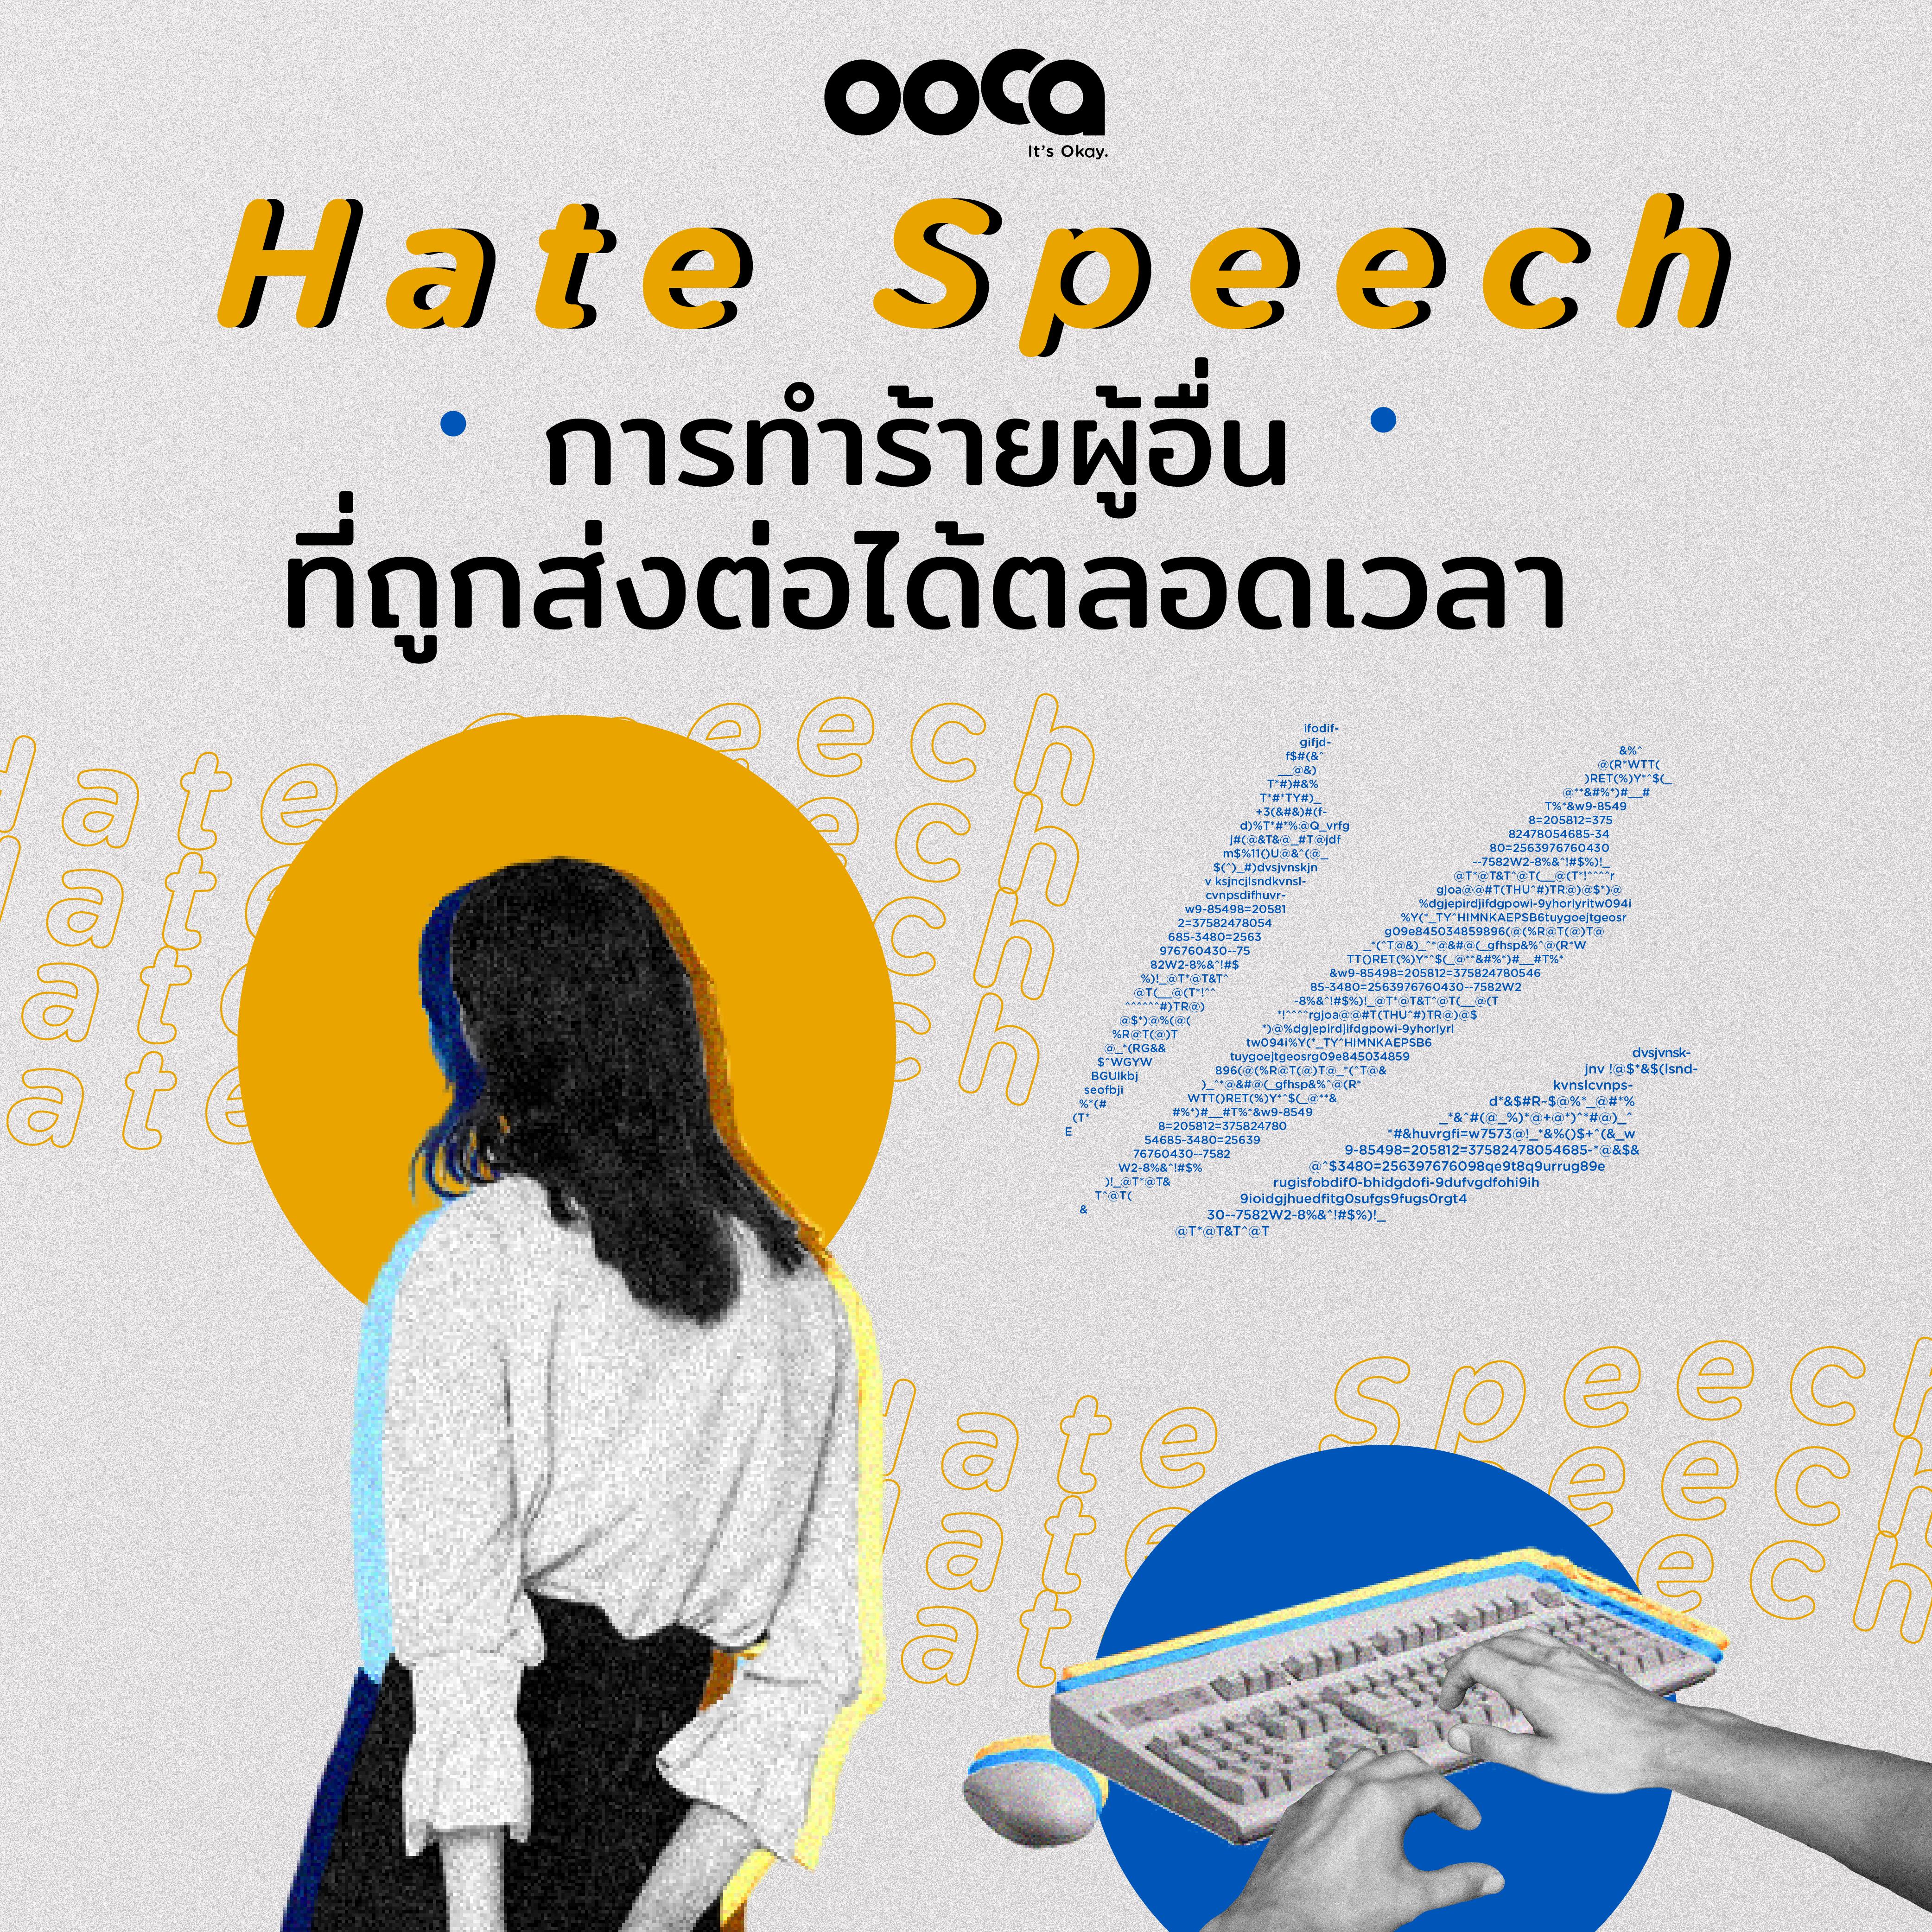 hate speech คืออะไร